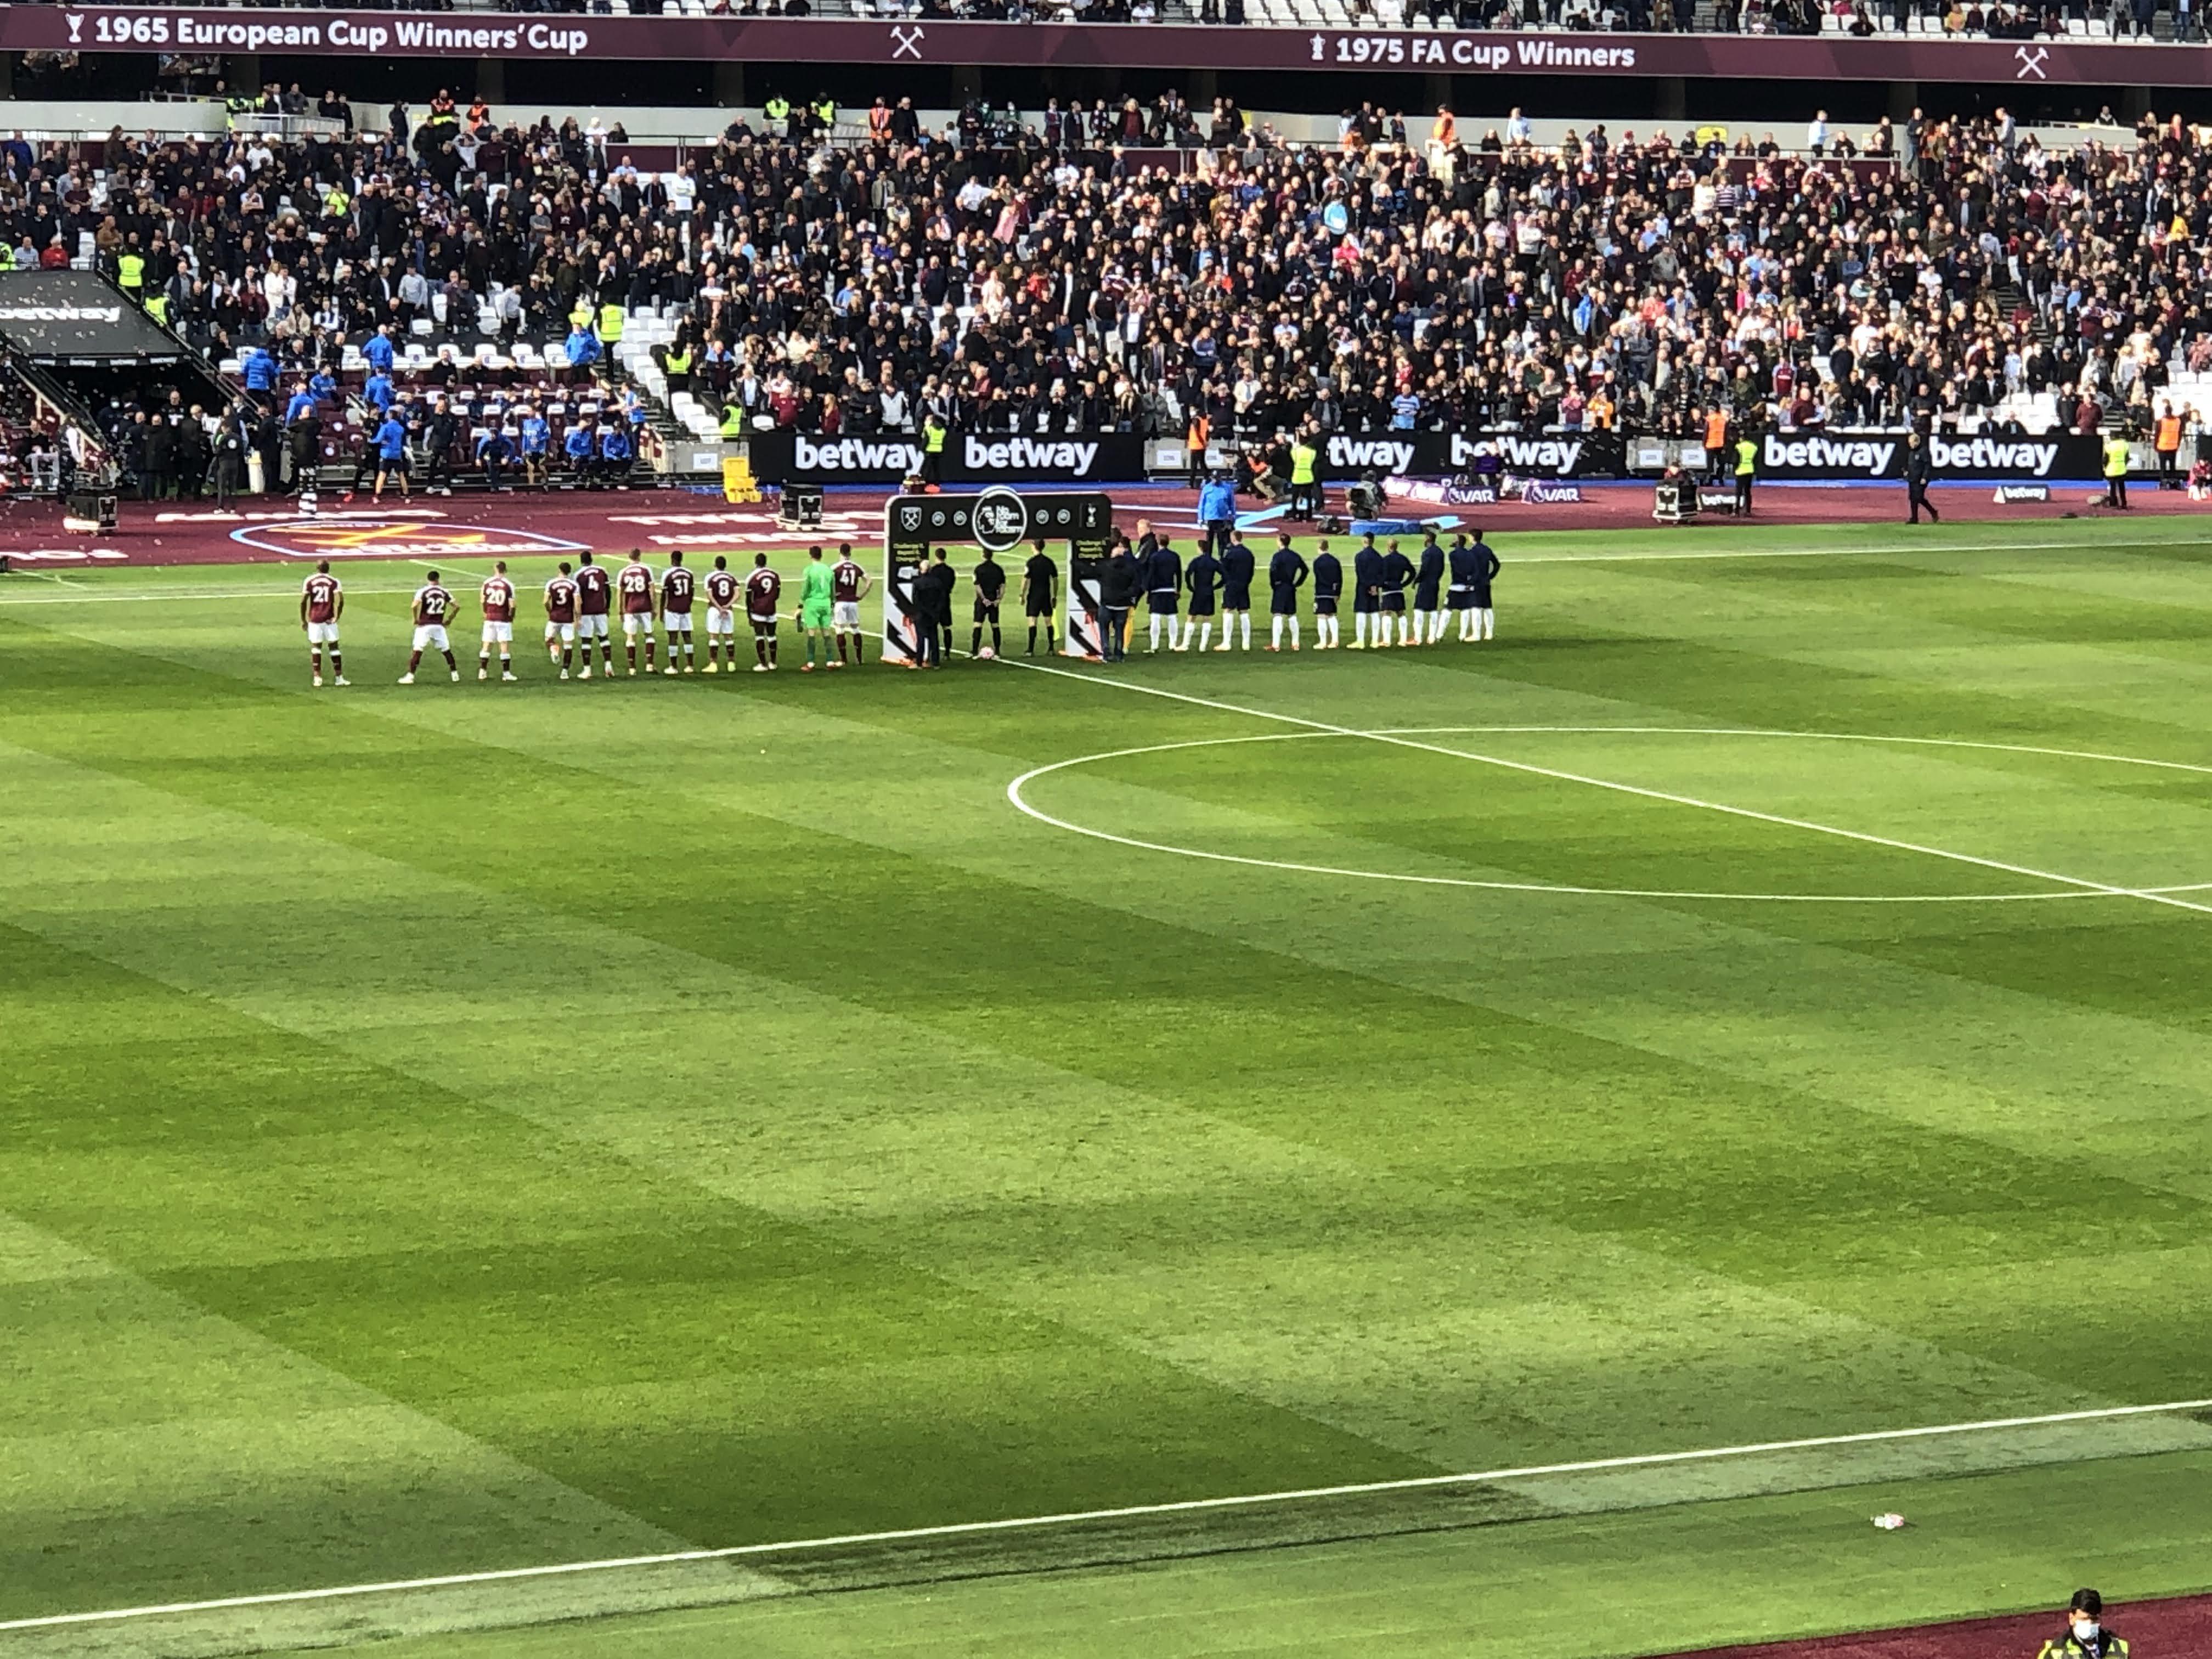 WHUFC 1 Tottenham 0 24/10/2021 EPL 2021-2022